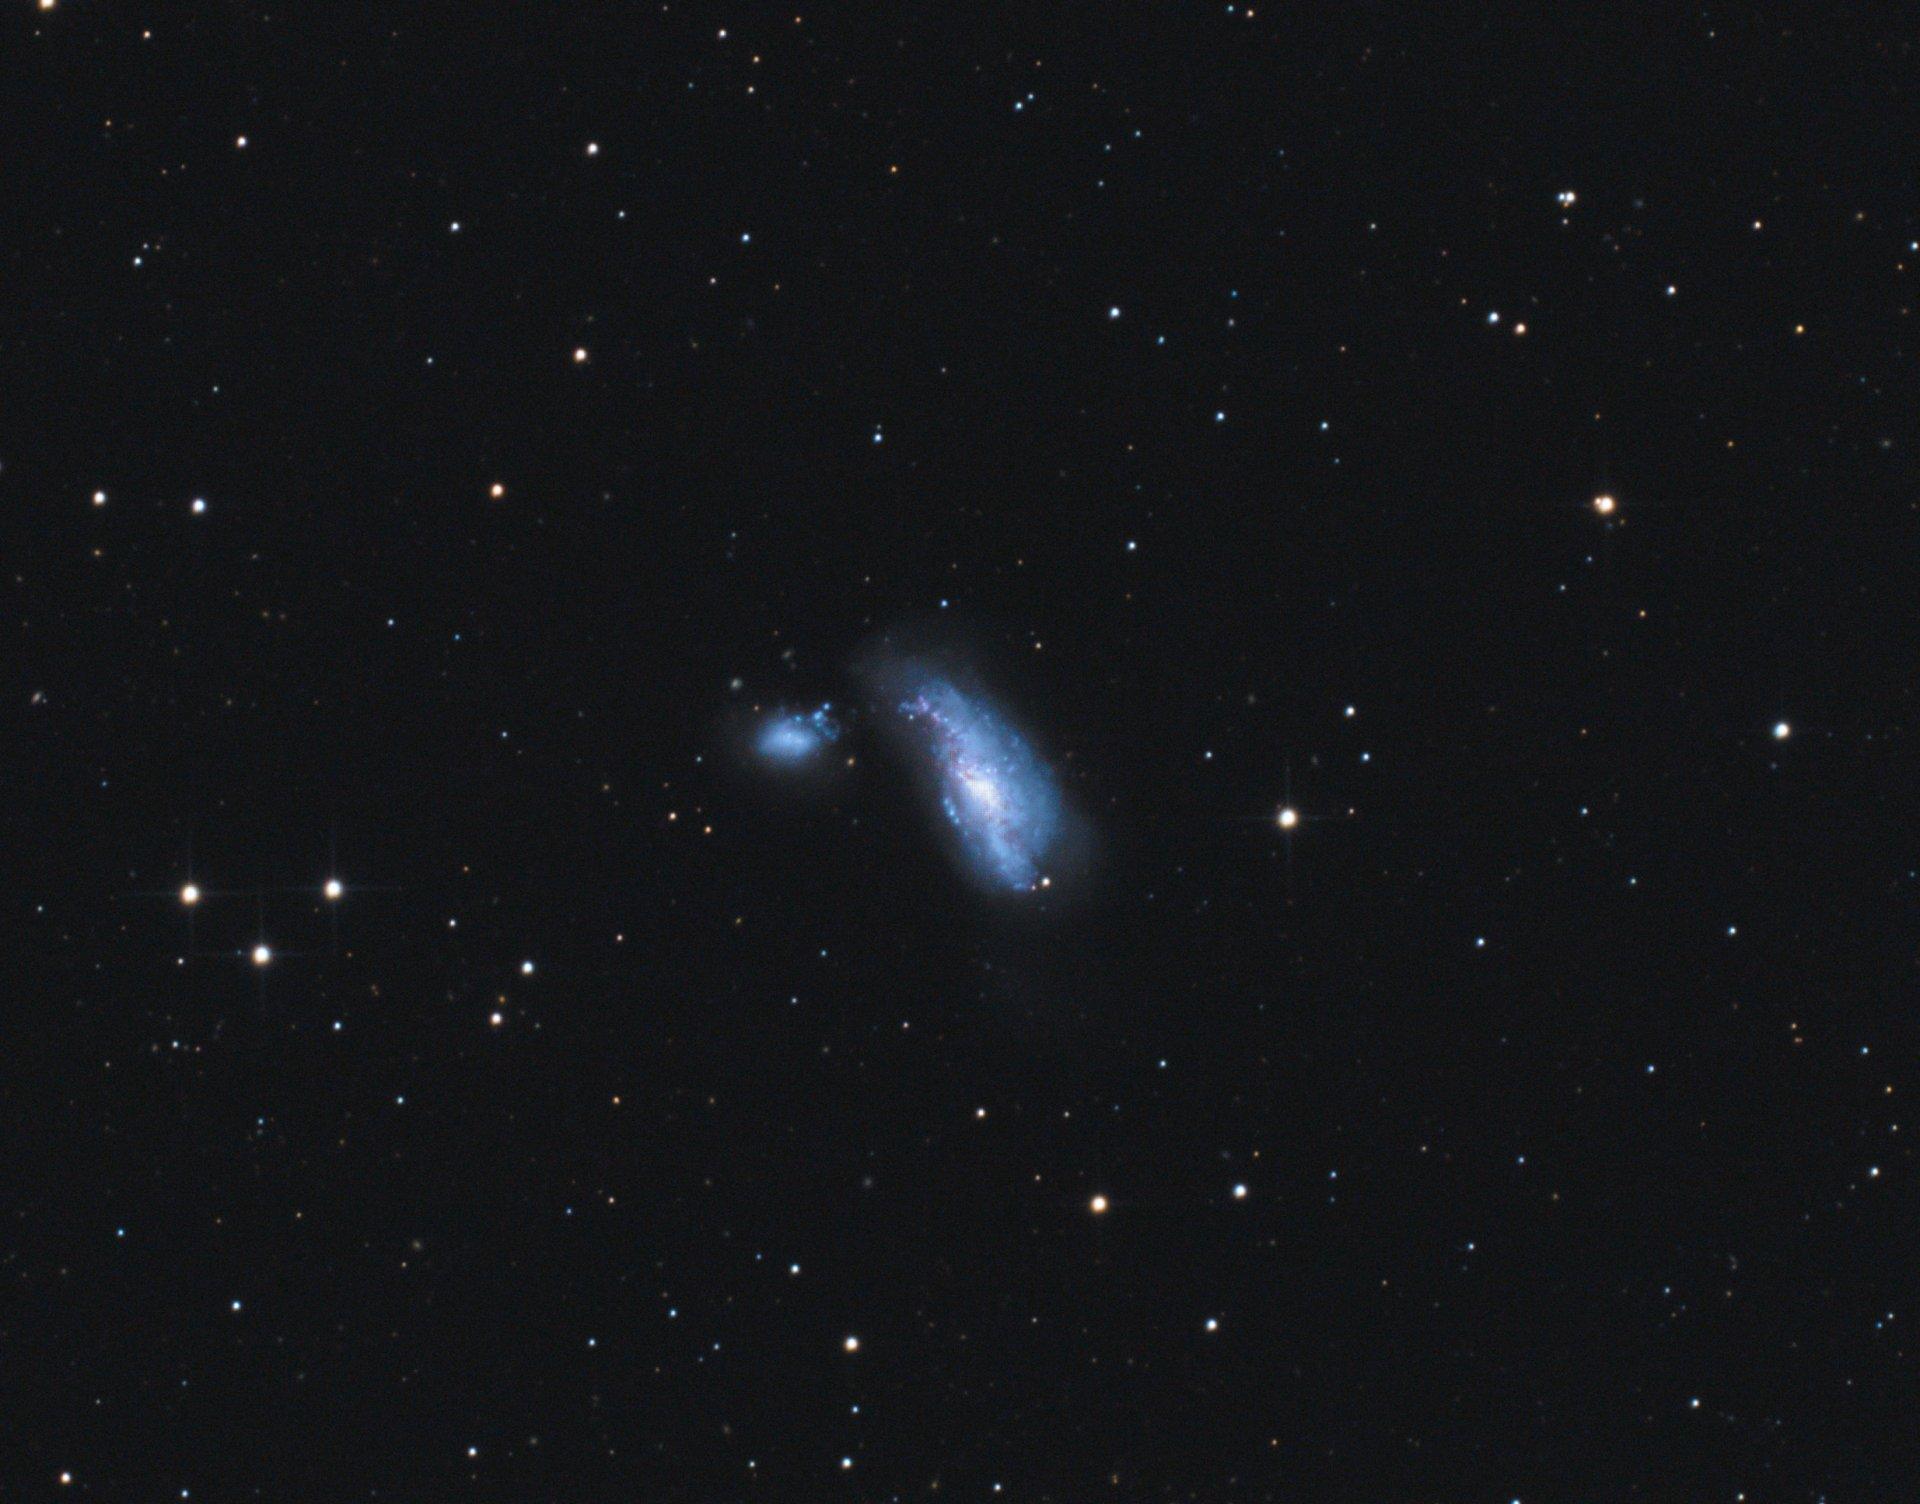 NGC_4485_90.jpg